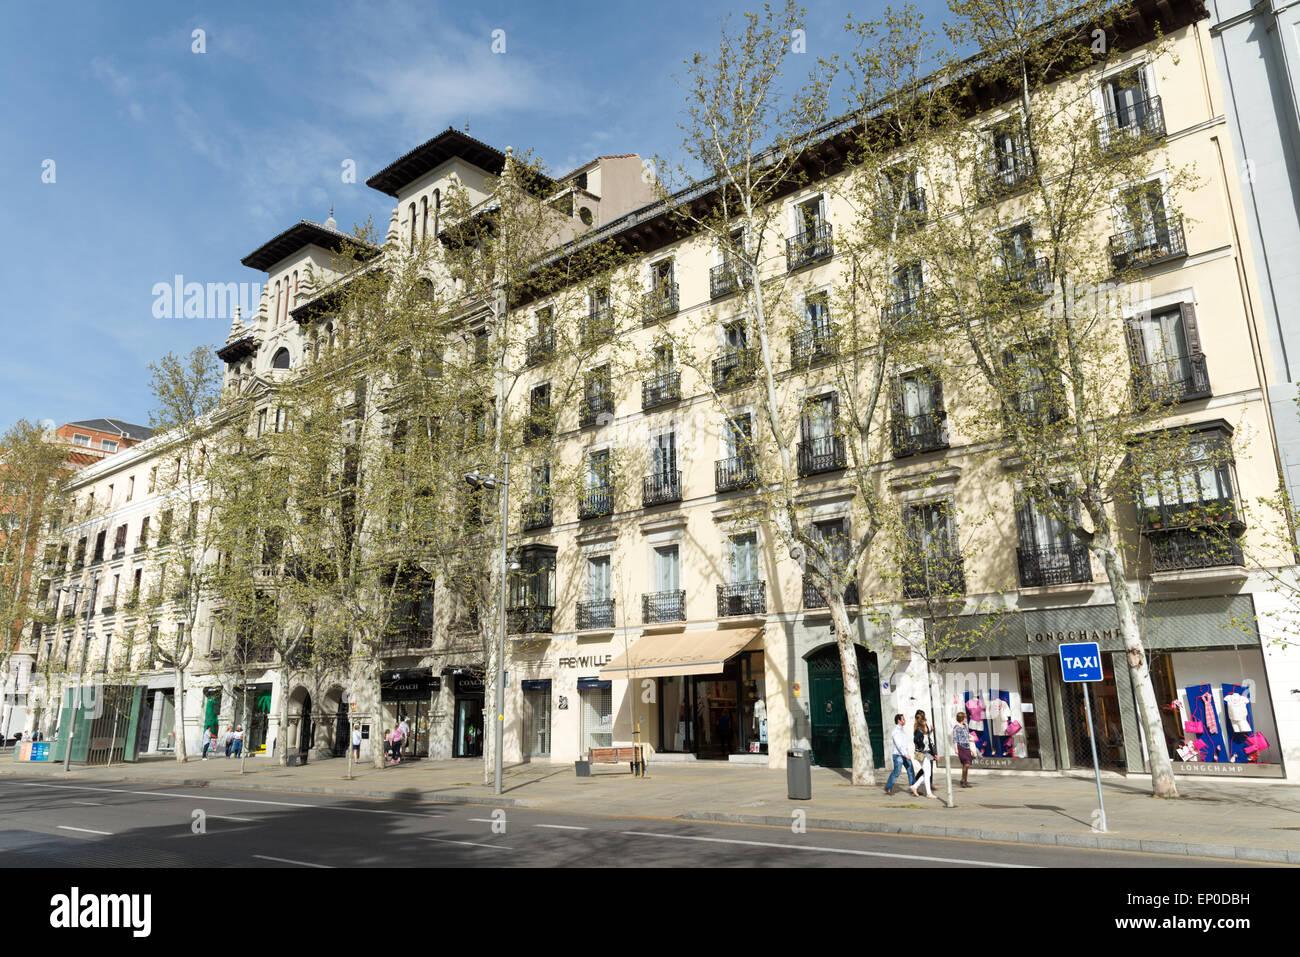 Calle serrano in the salamanca district madrid spain - Calle valencia salamanca ...